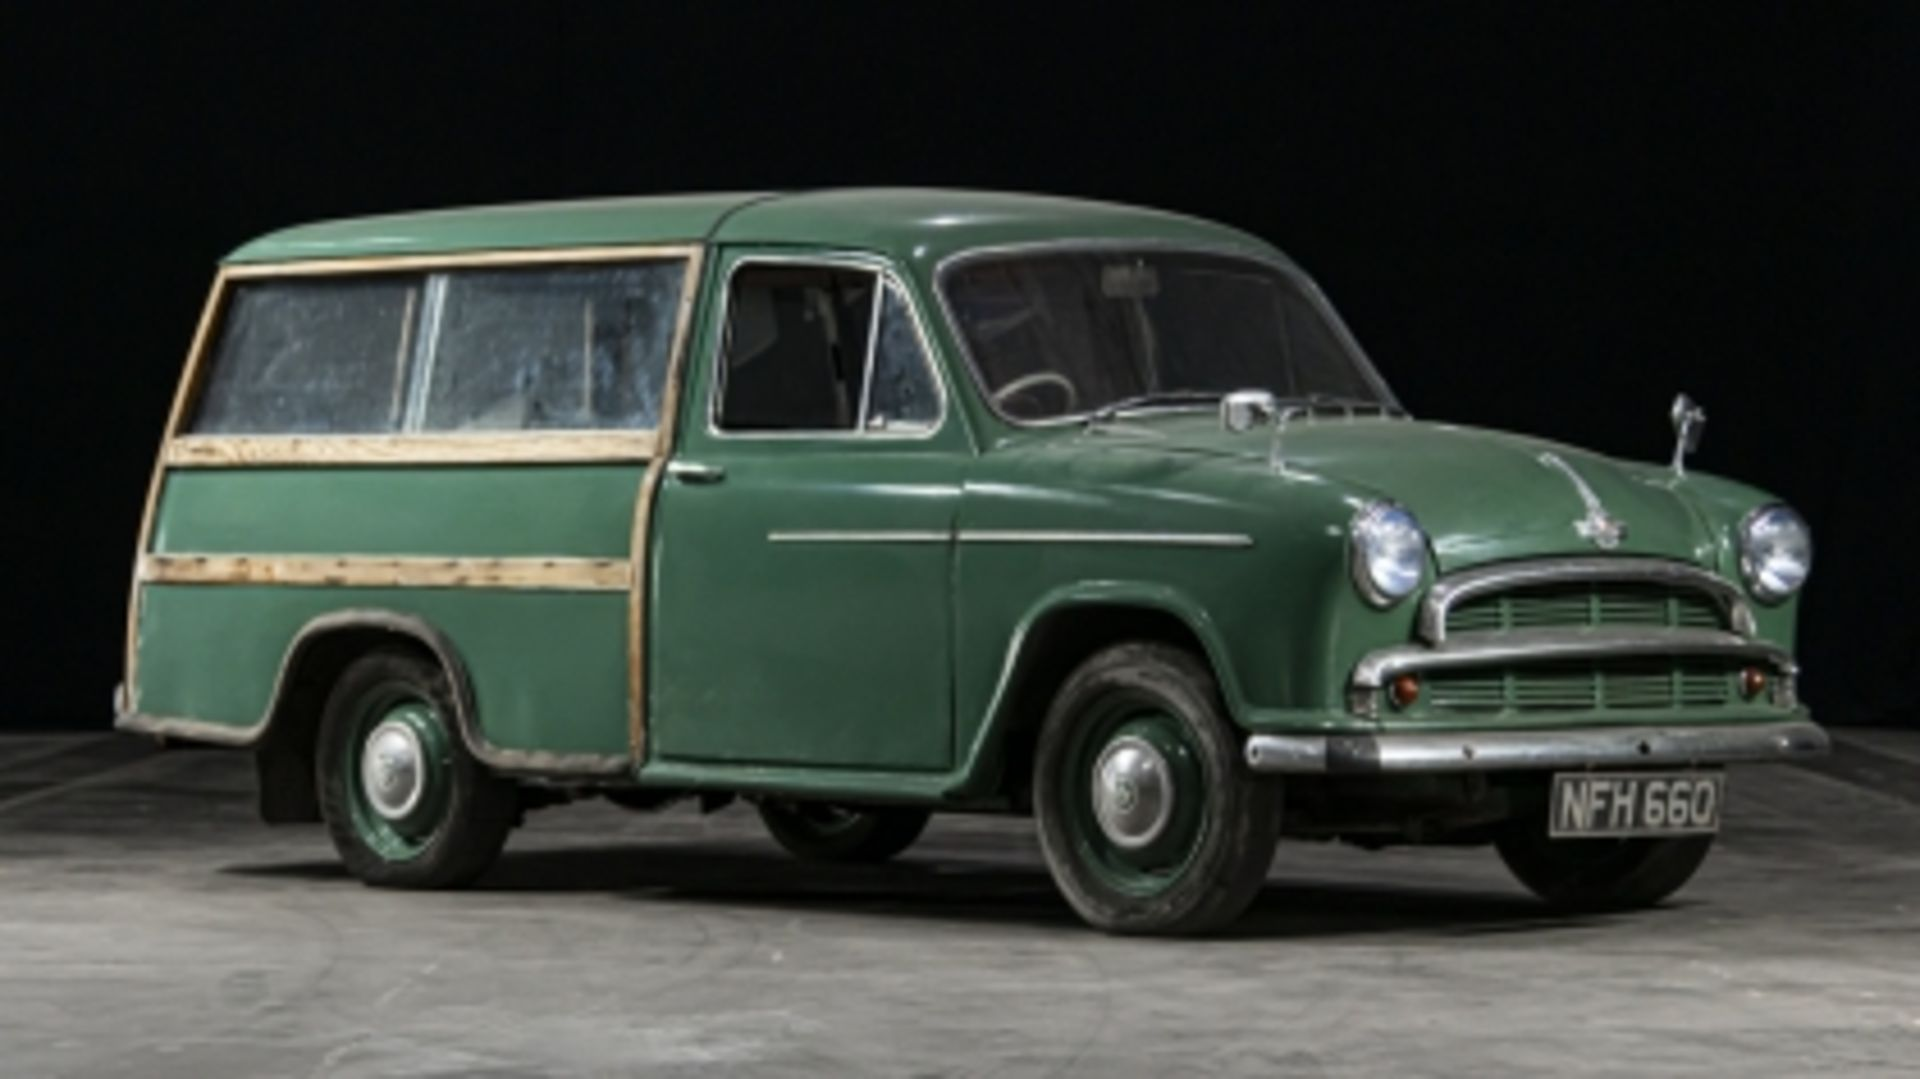 Lot 562 - 1955 Morris Oxford Series II Traveller